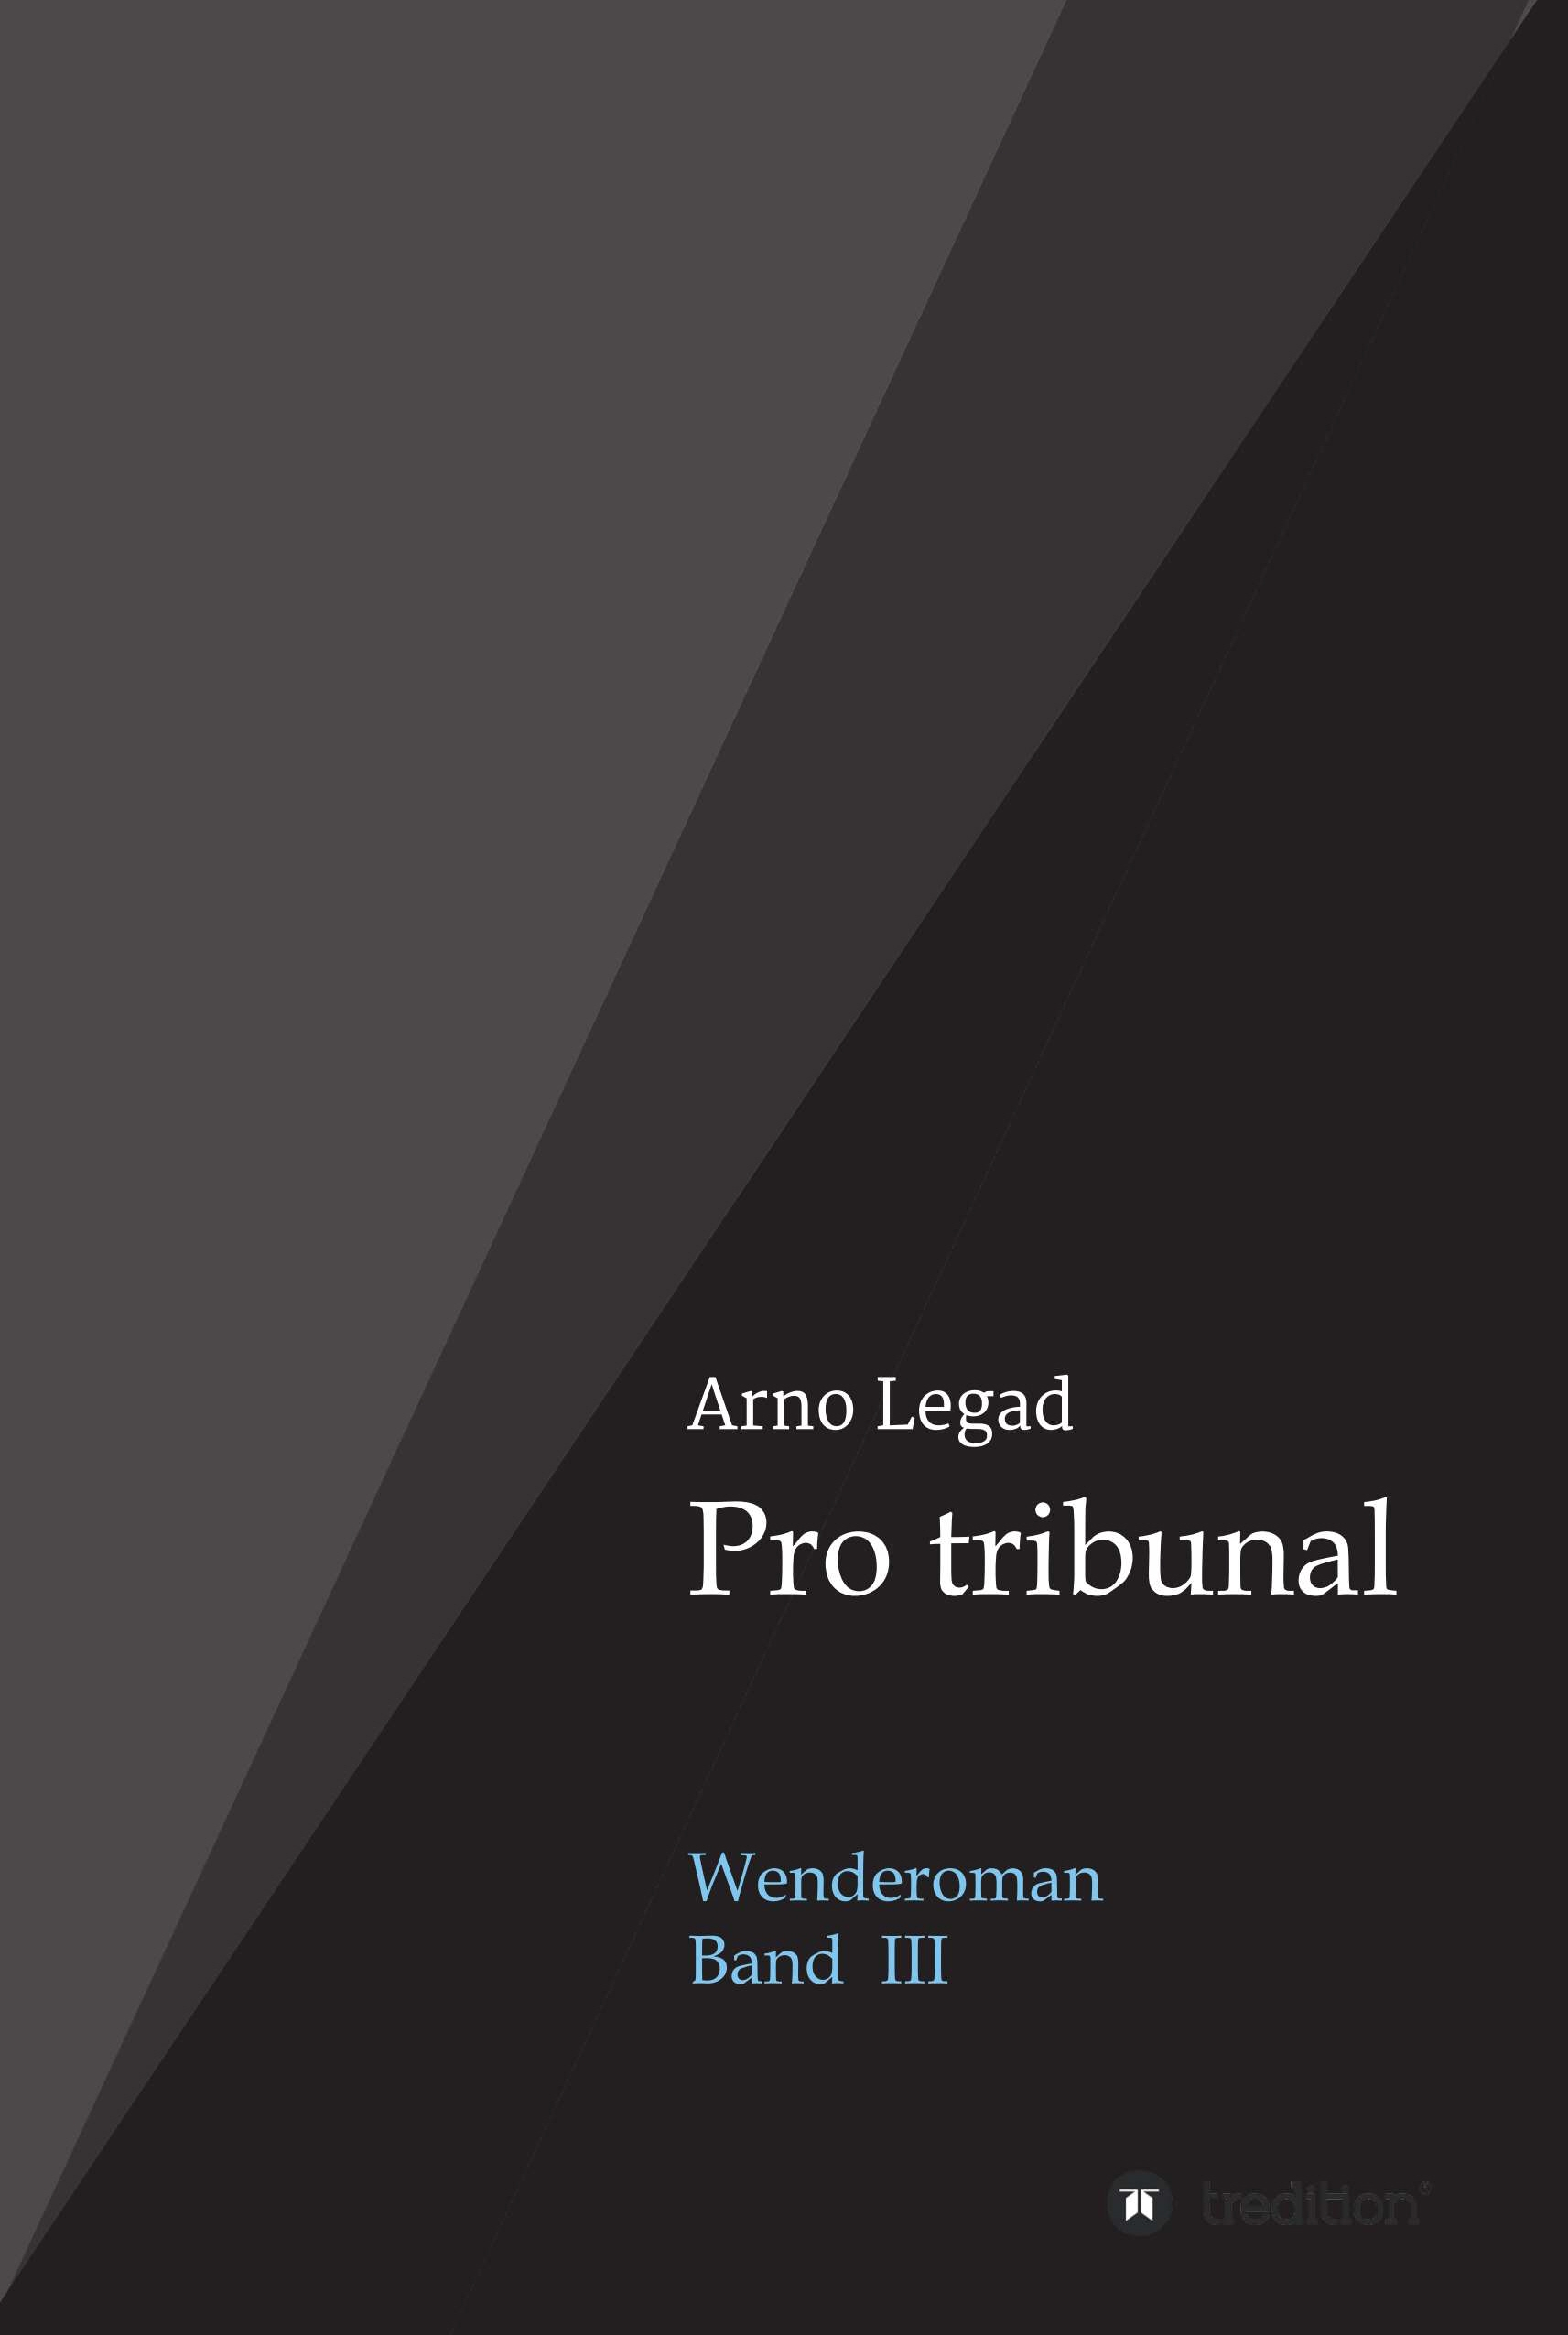 Pro tribunal